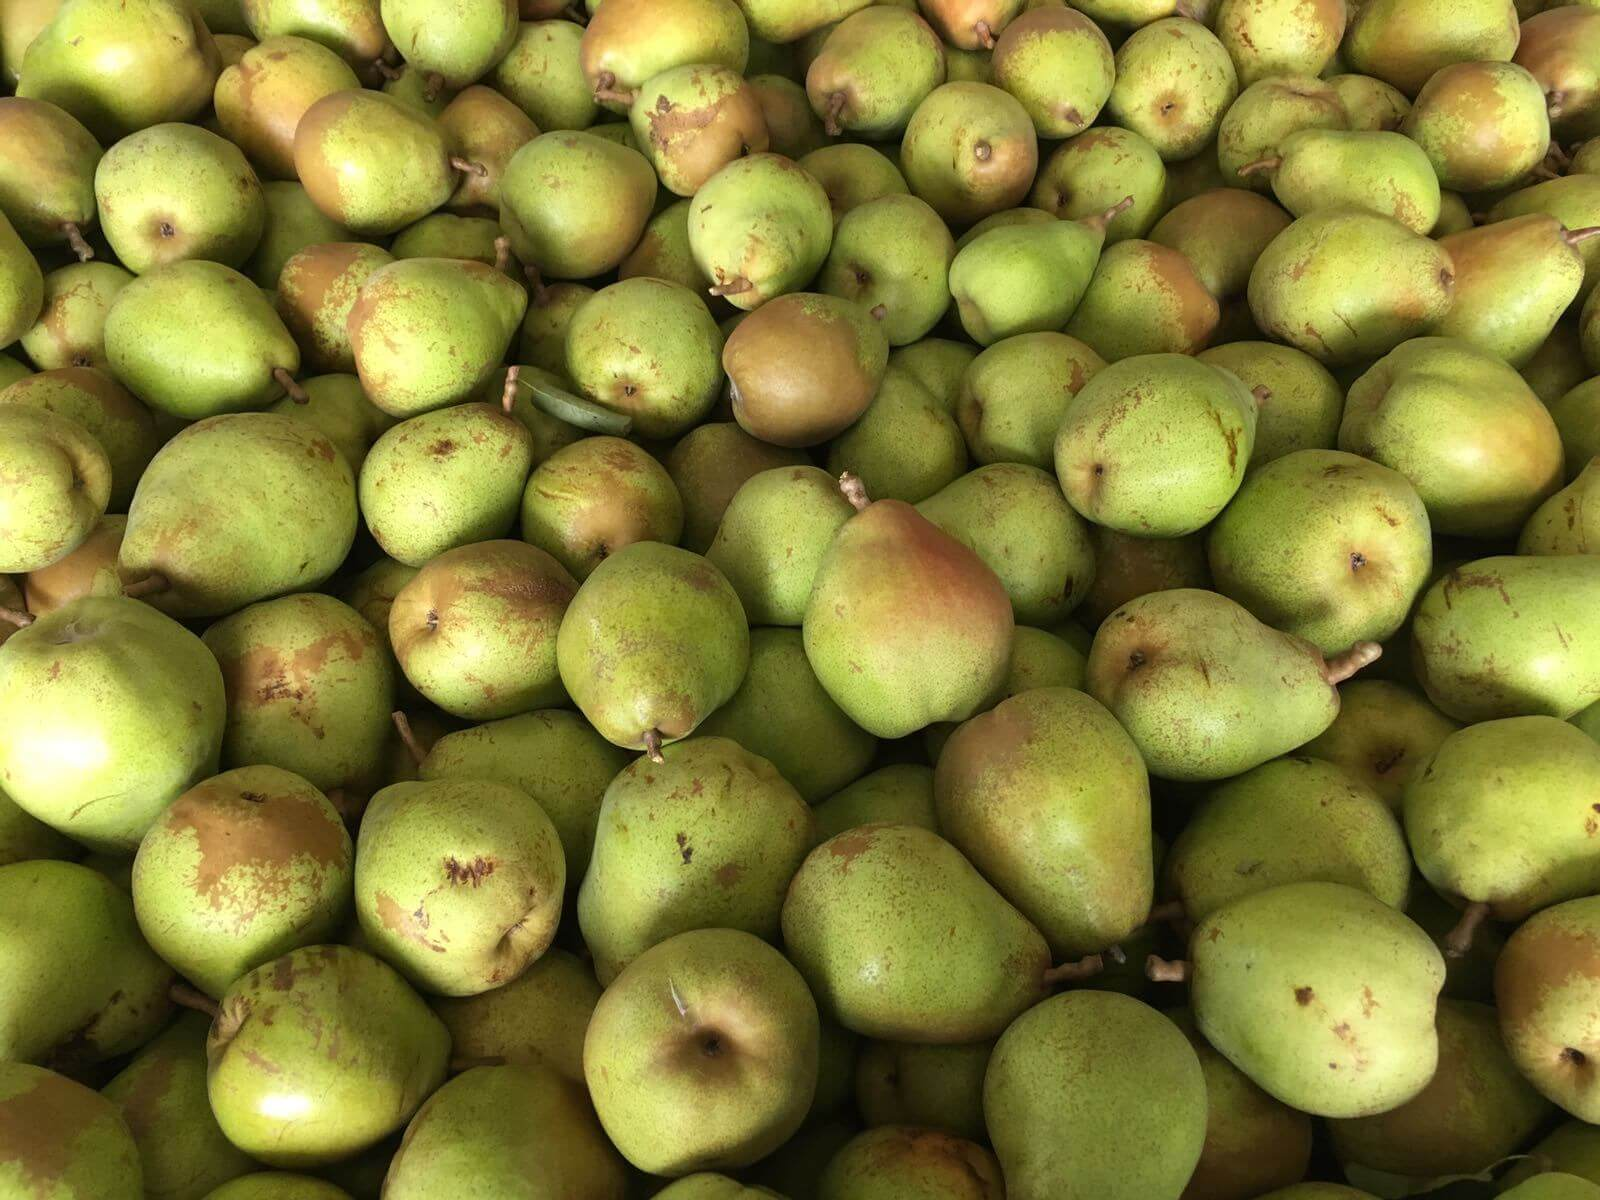 Fruitbedrijf-Van-den-Berge_Doyenne du Comice_ 2017